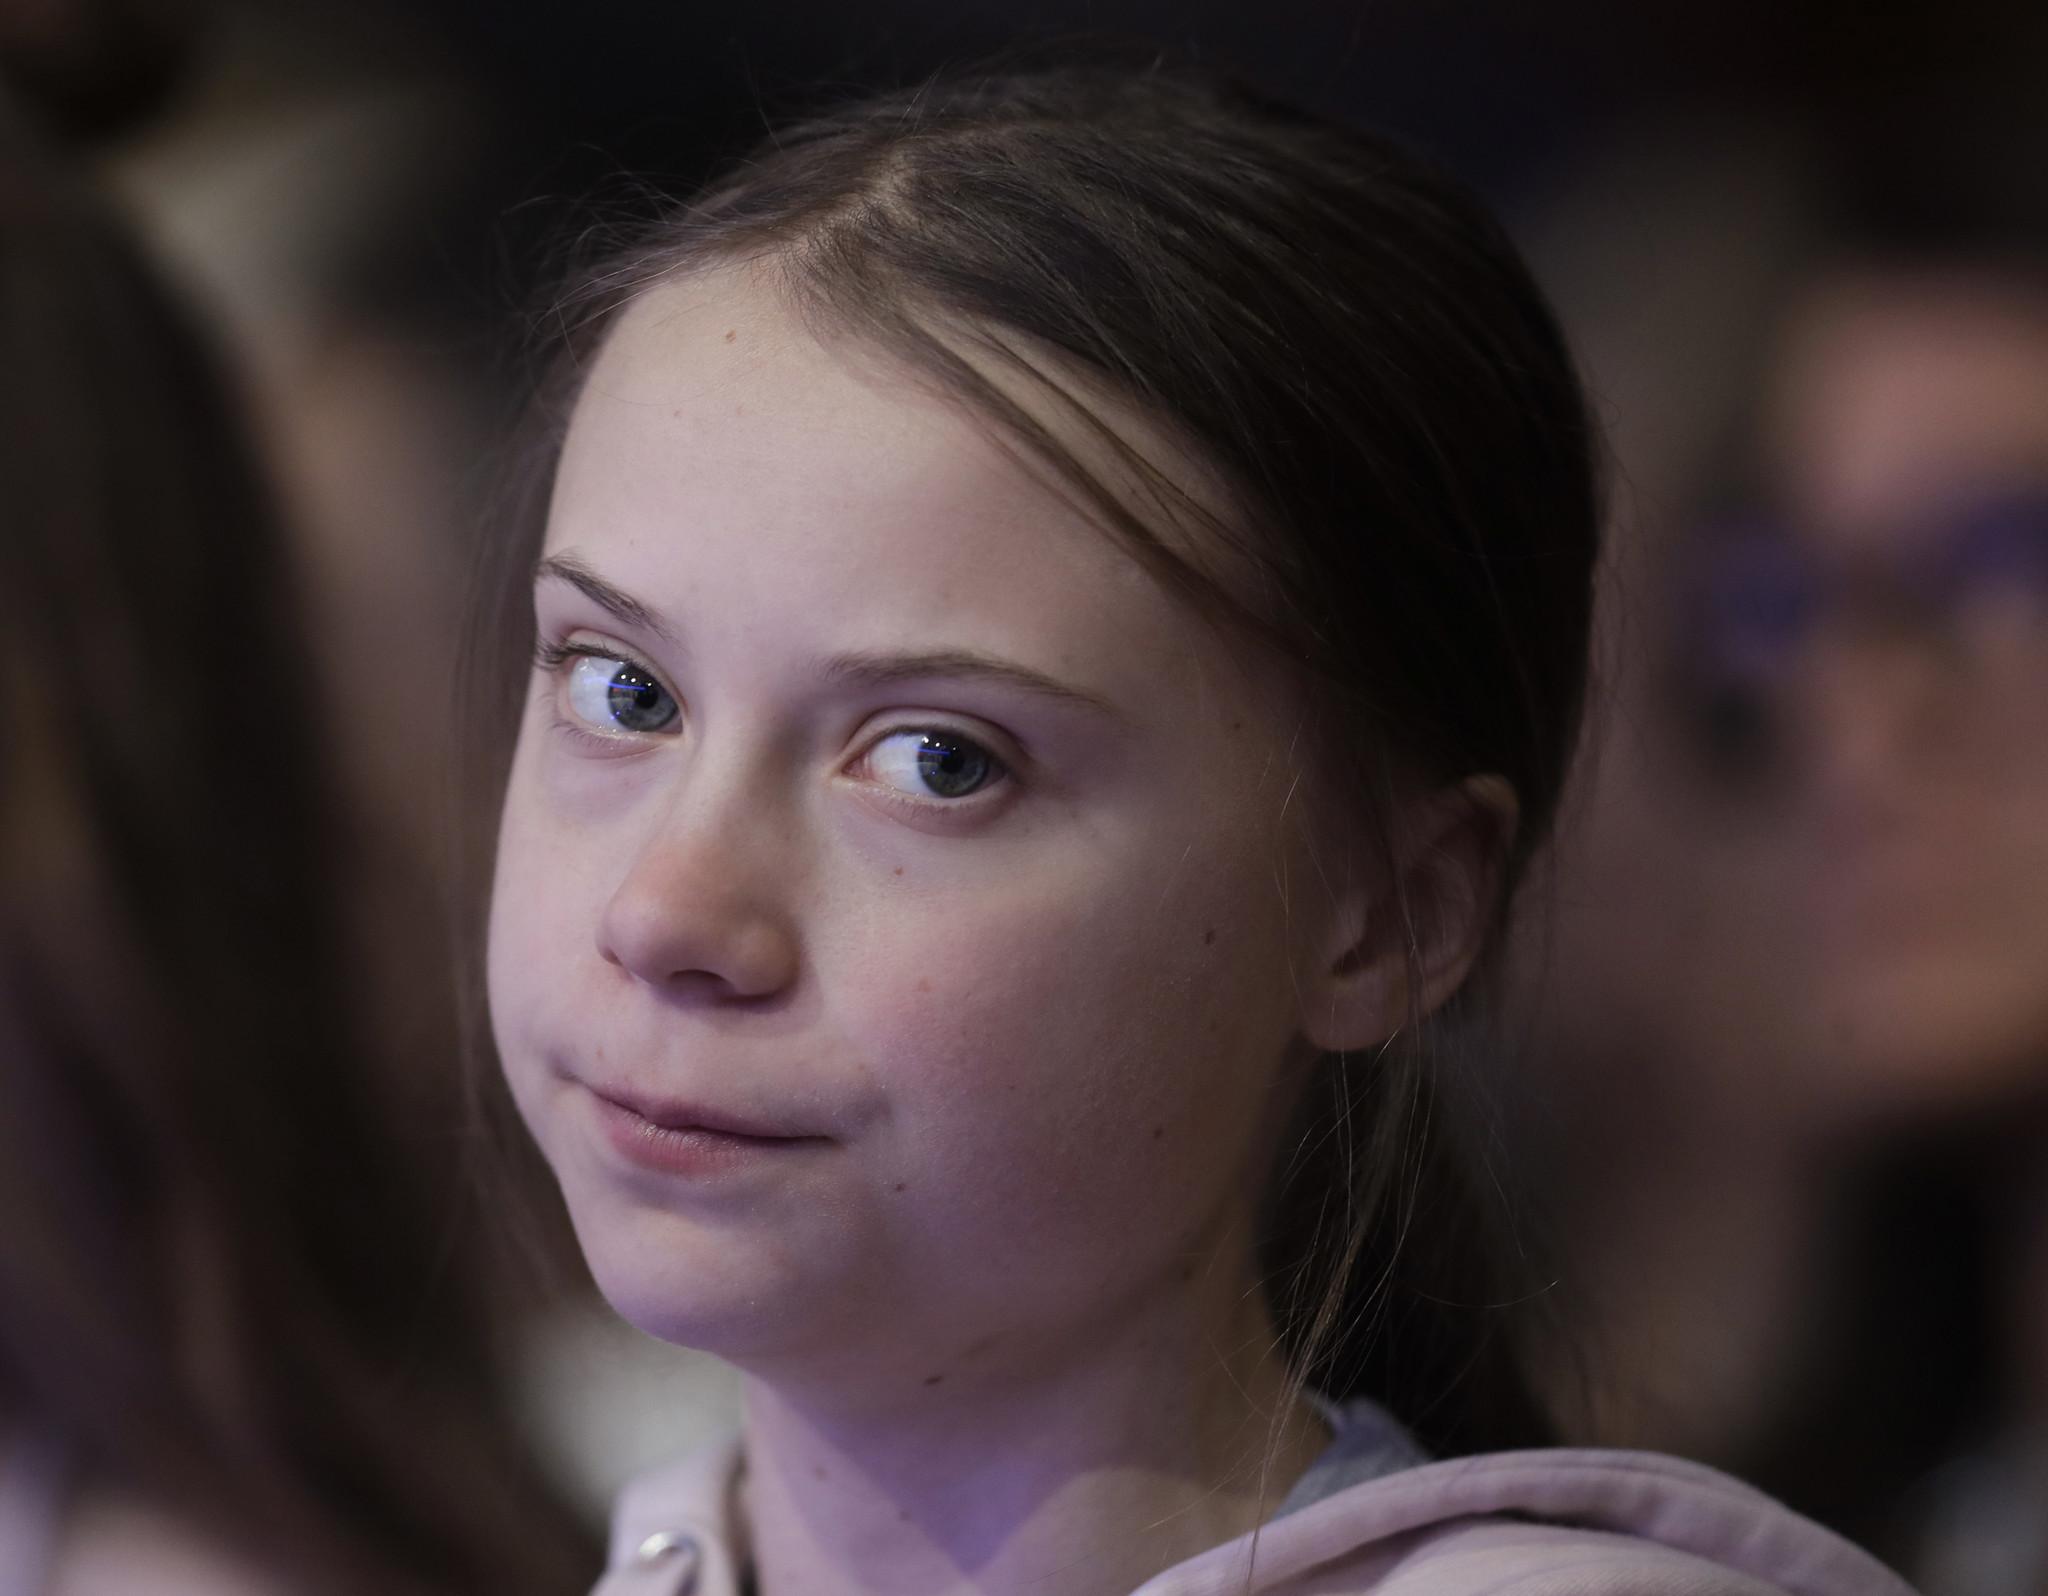 Climate activist Greta Thunberg, 17, nominated for Nobel Peace Prize